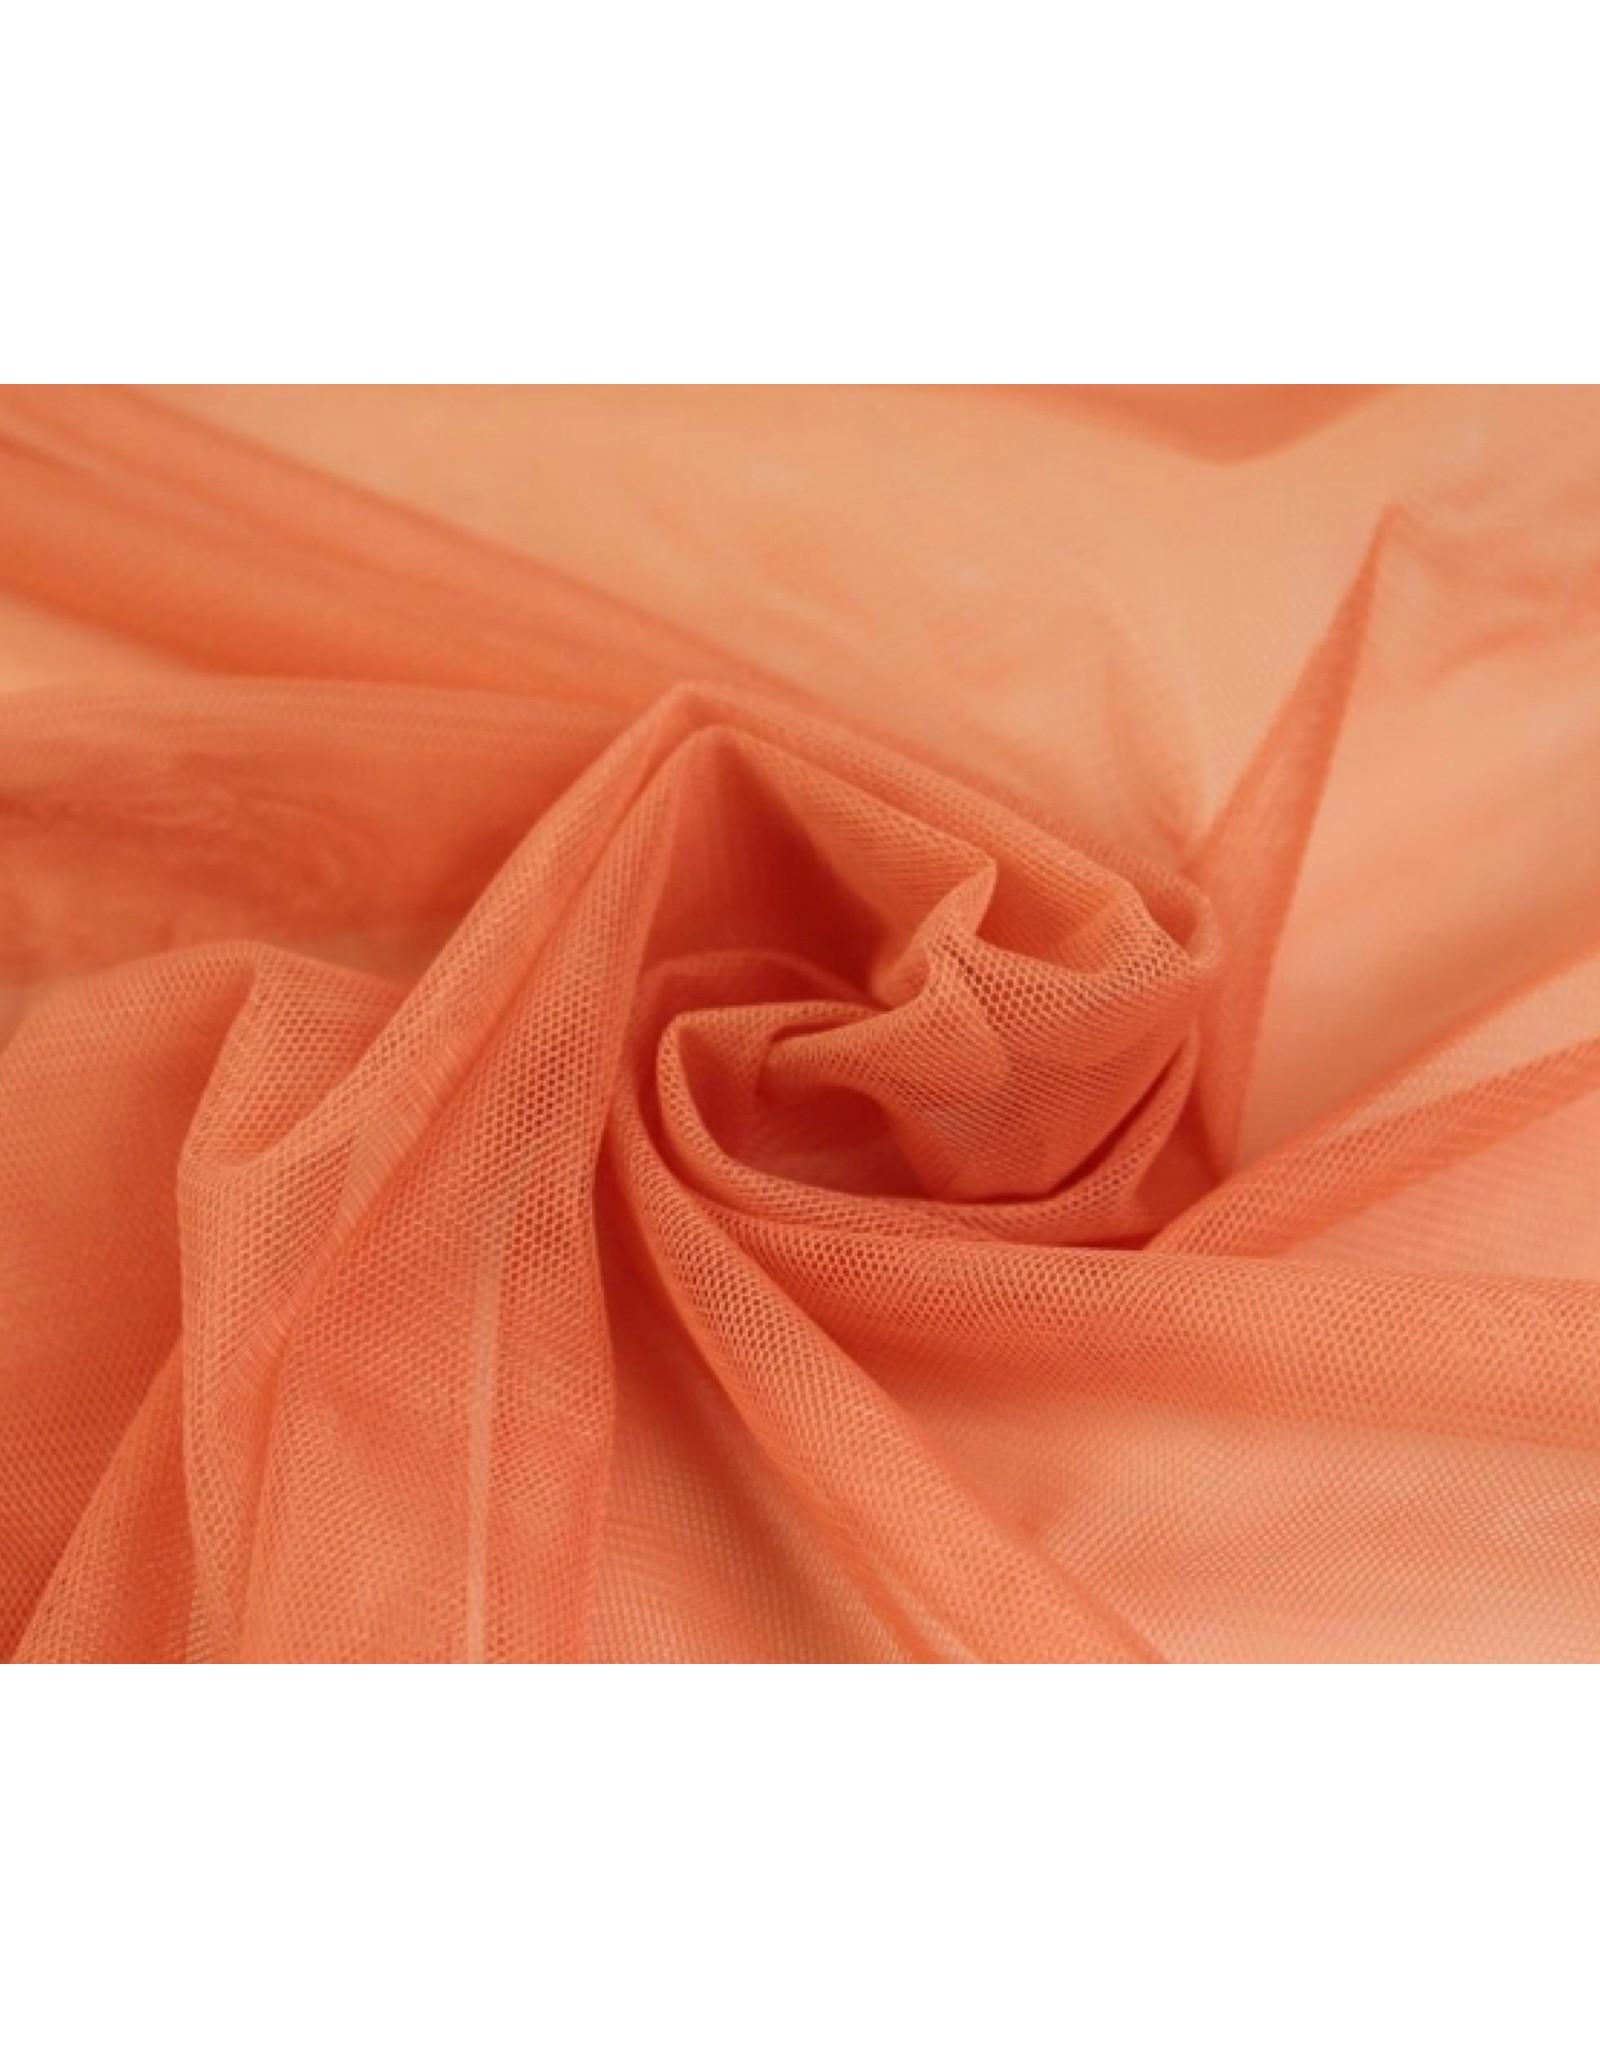 Soft Mesh Tule - Coral